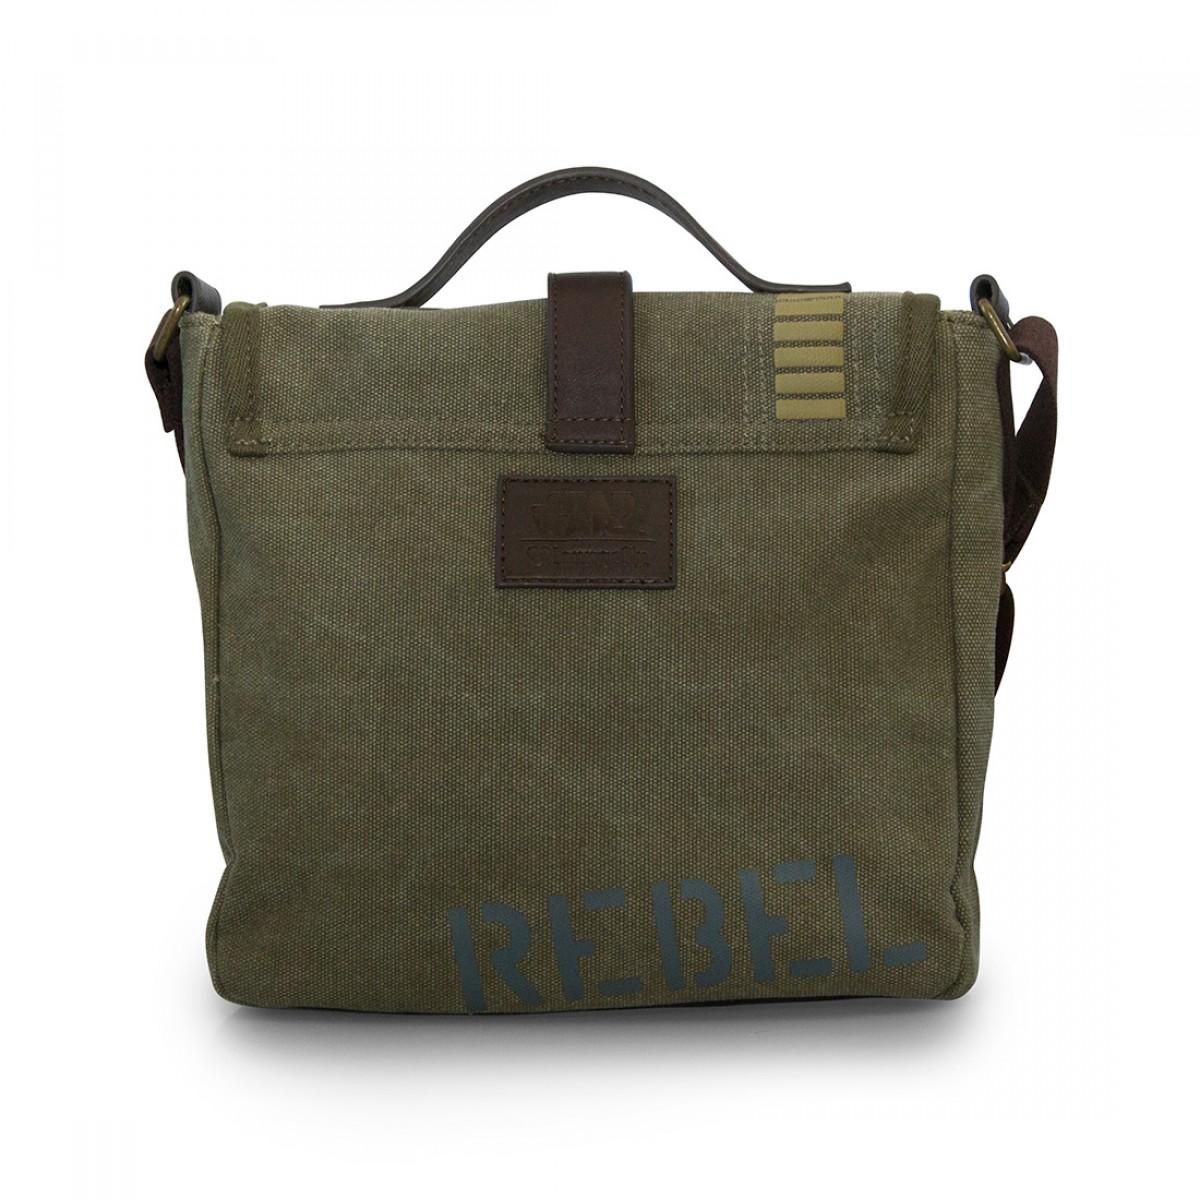 3a00cabe08 Star Wars Rogue One Rebel Alliance Crossbody Messenger Bag